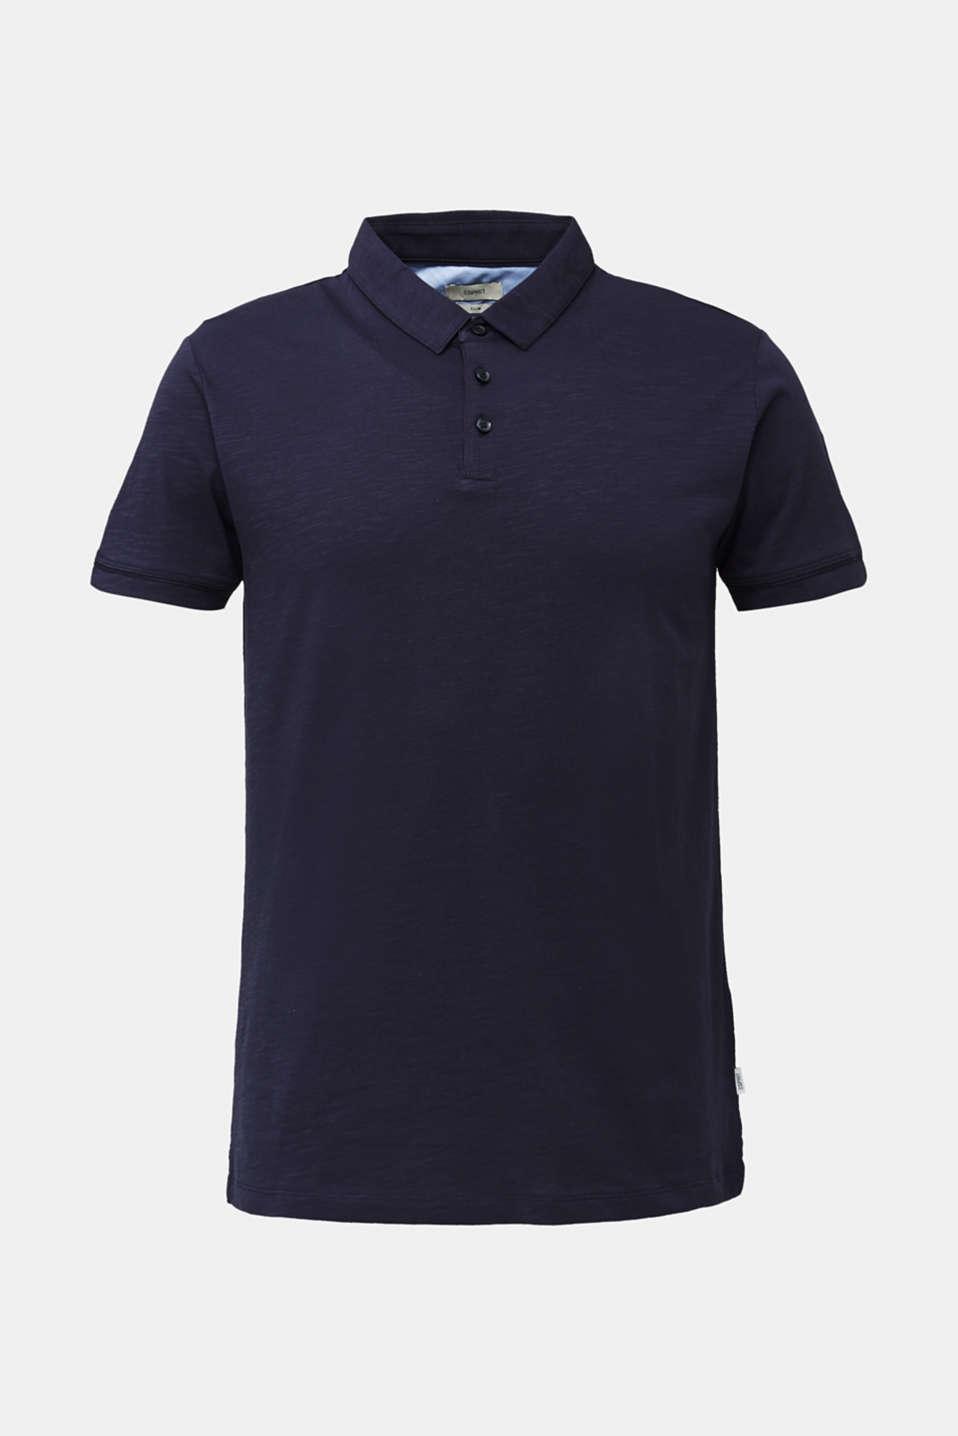 Slub jersey polo shirt, 100% cotton, NAVY, detail image number 6